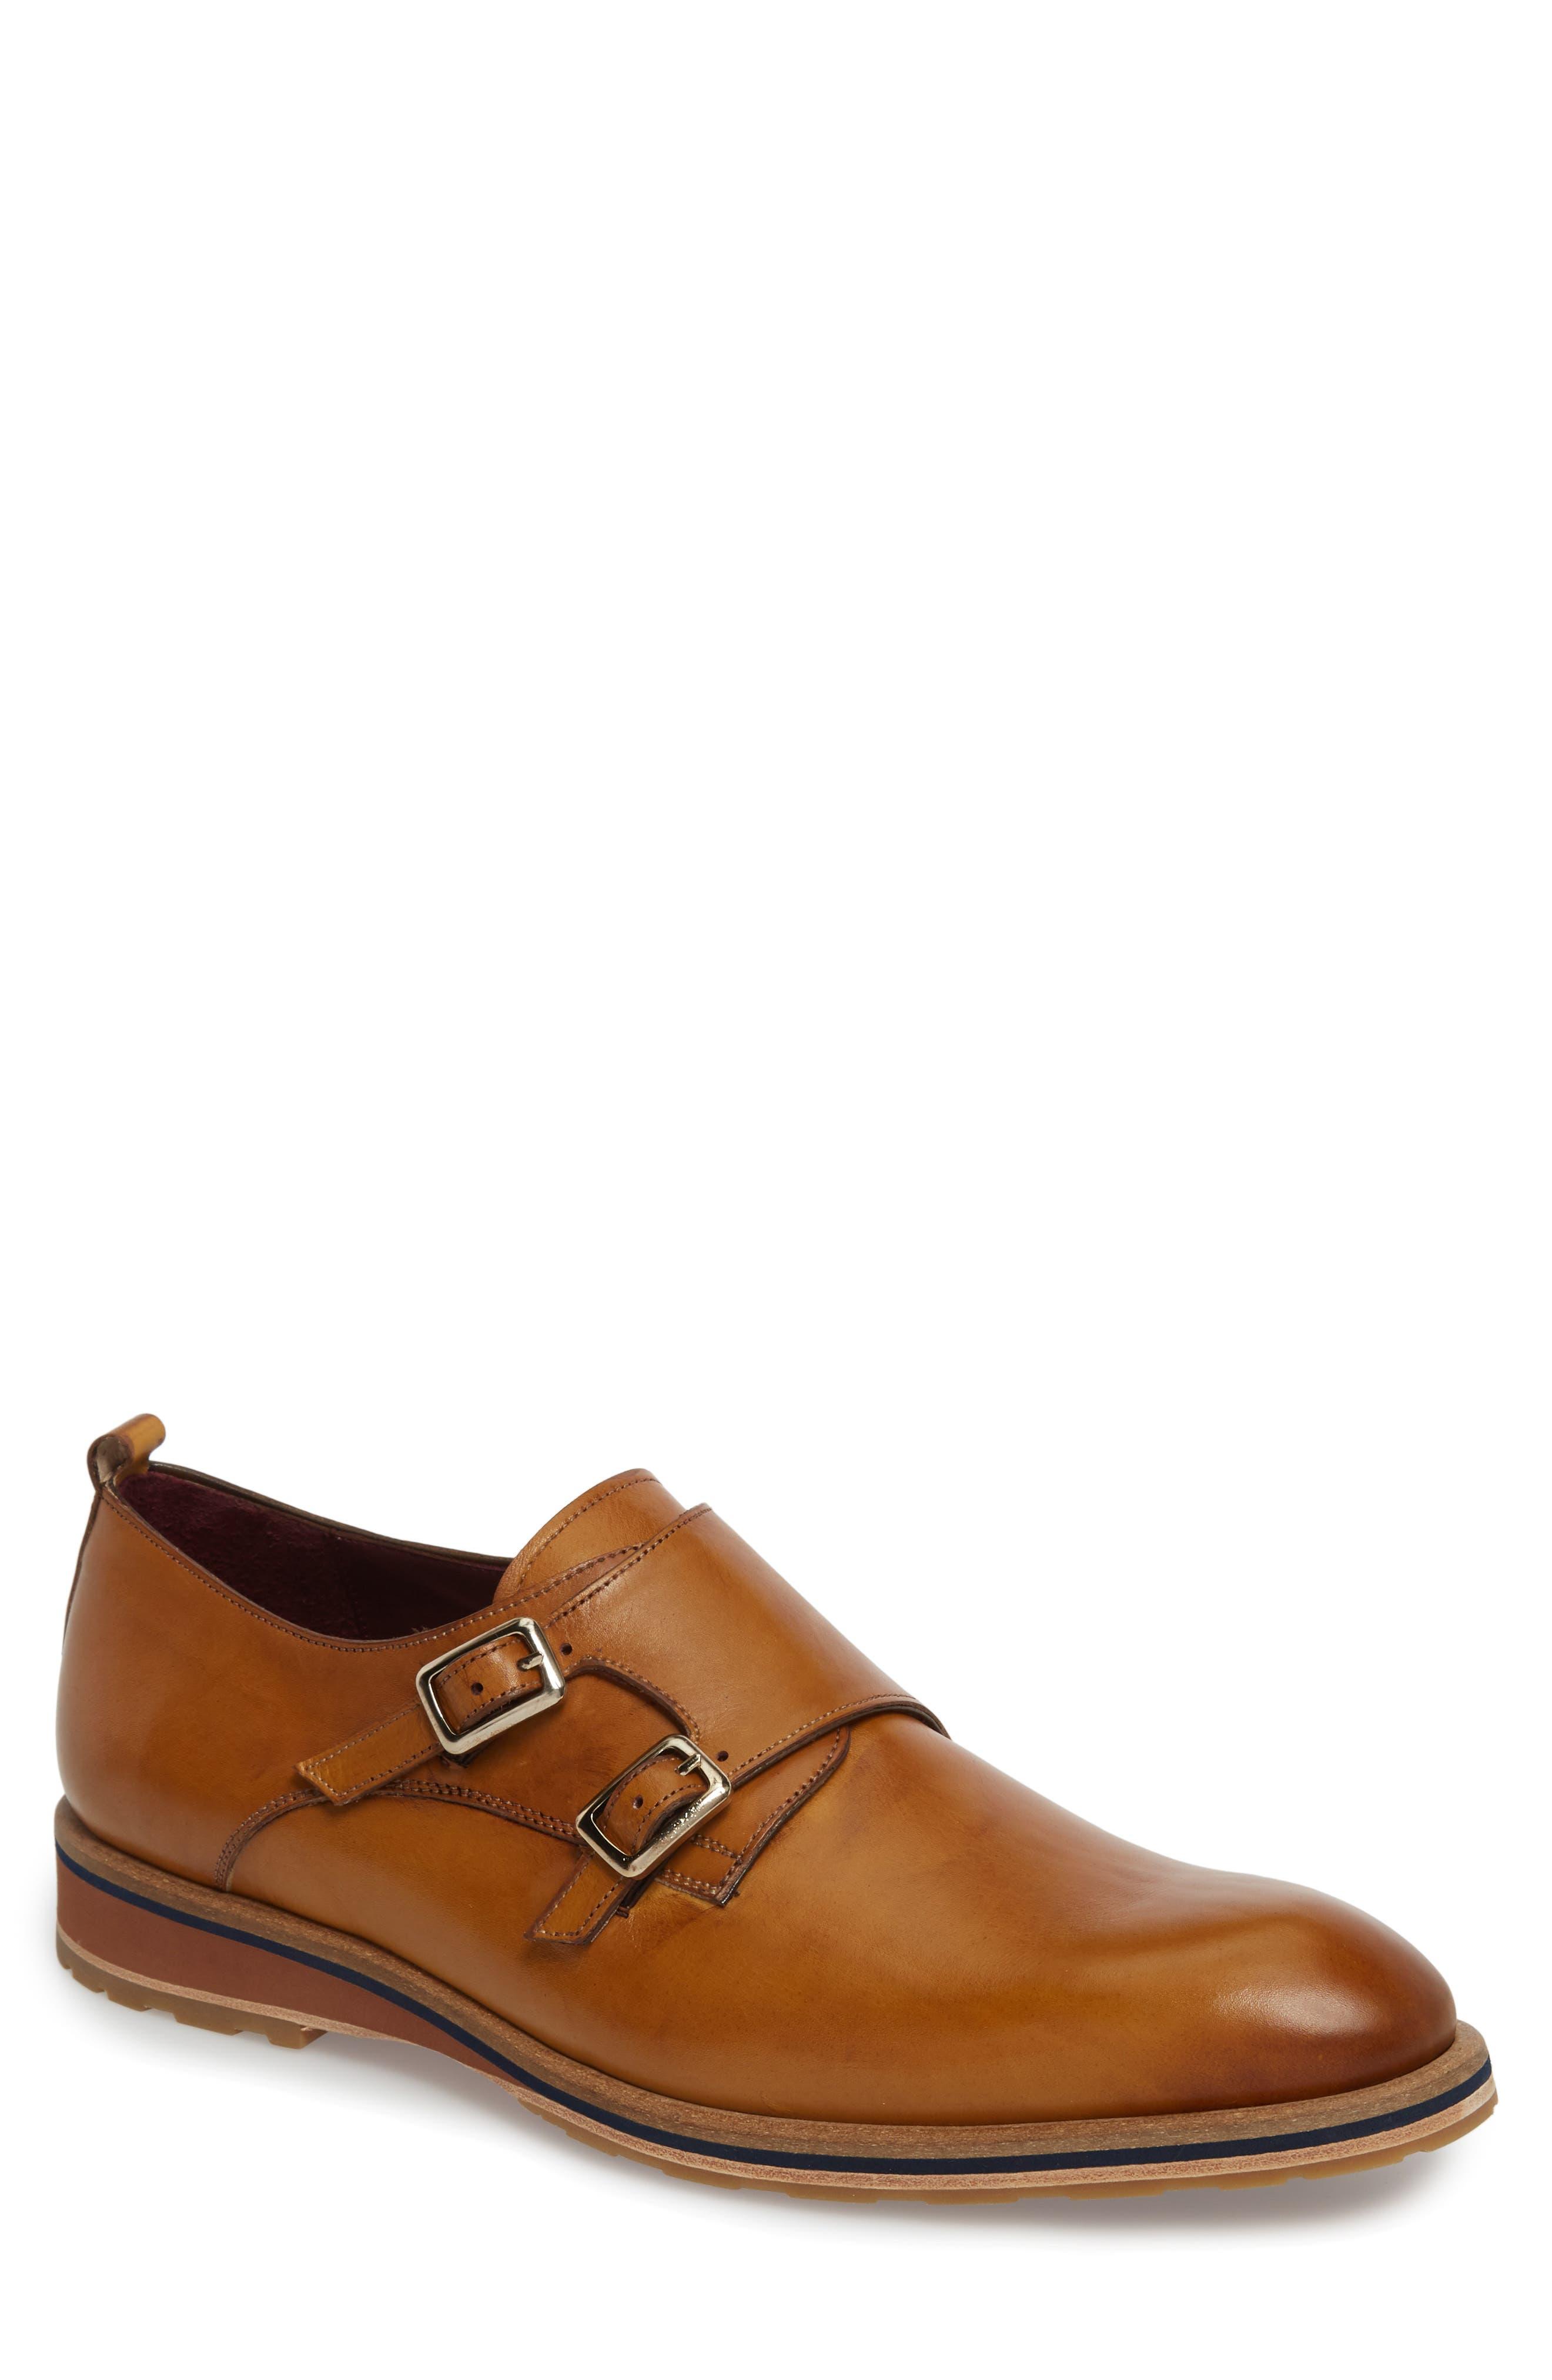 Apolo Double Buckle Monk Shoe,                             Main thumbnail 1, color,                             Honey Leather